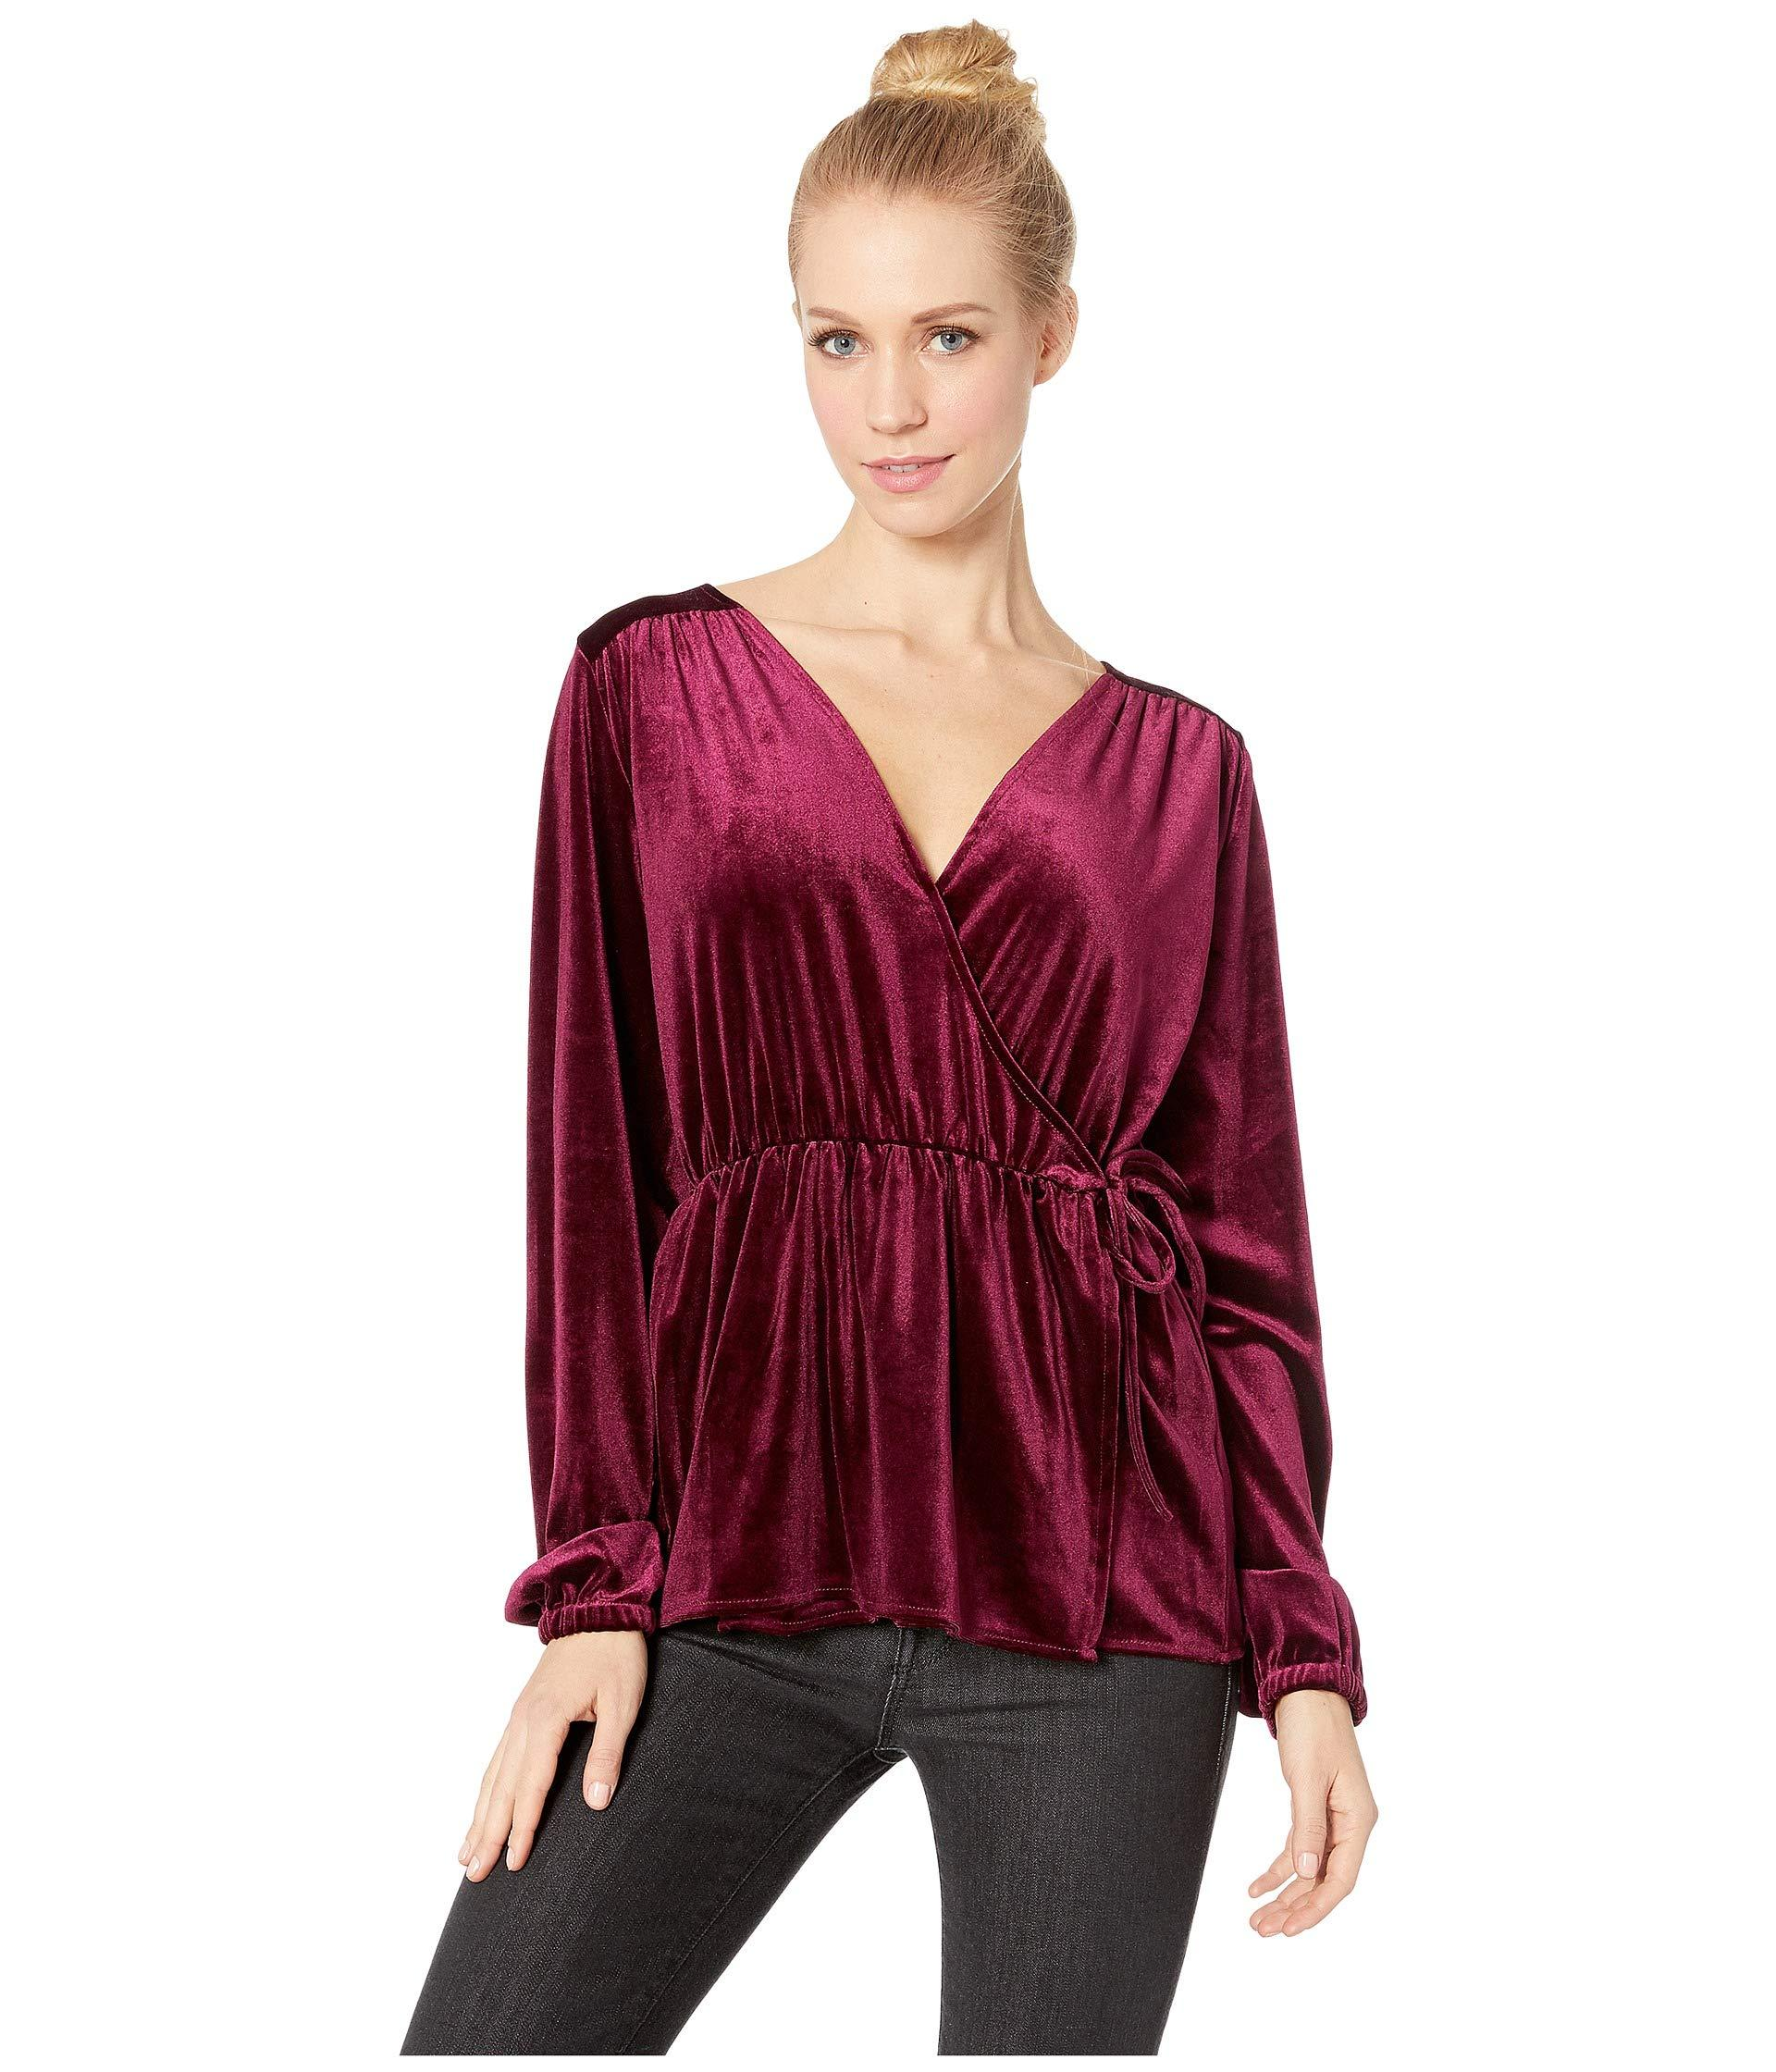 64b852f58e5e67 Lyst - Jack BB Dakota Hello M lady Velvet Peplum Top in Purple ...